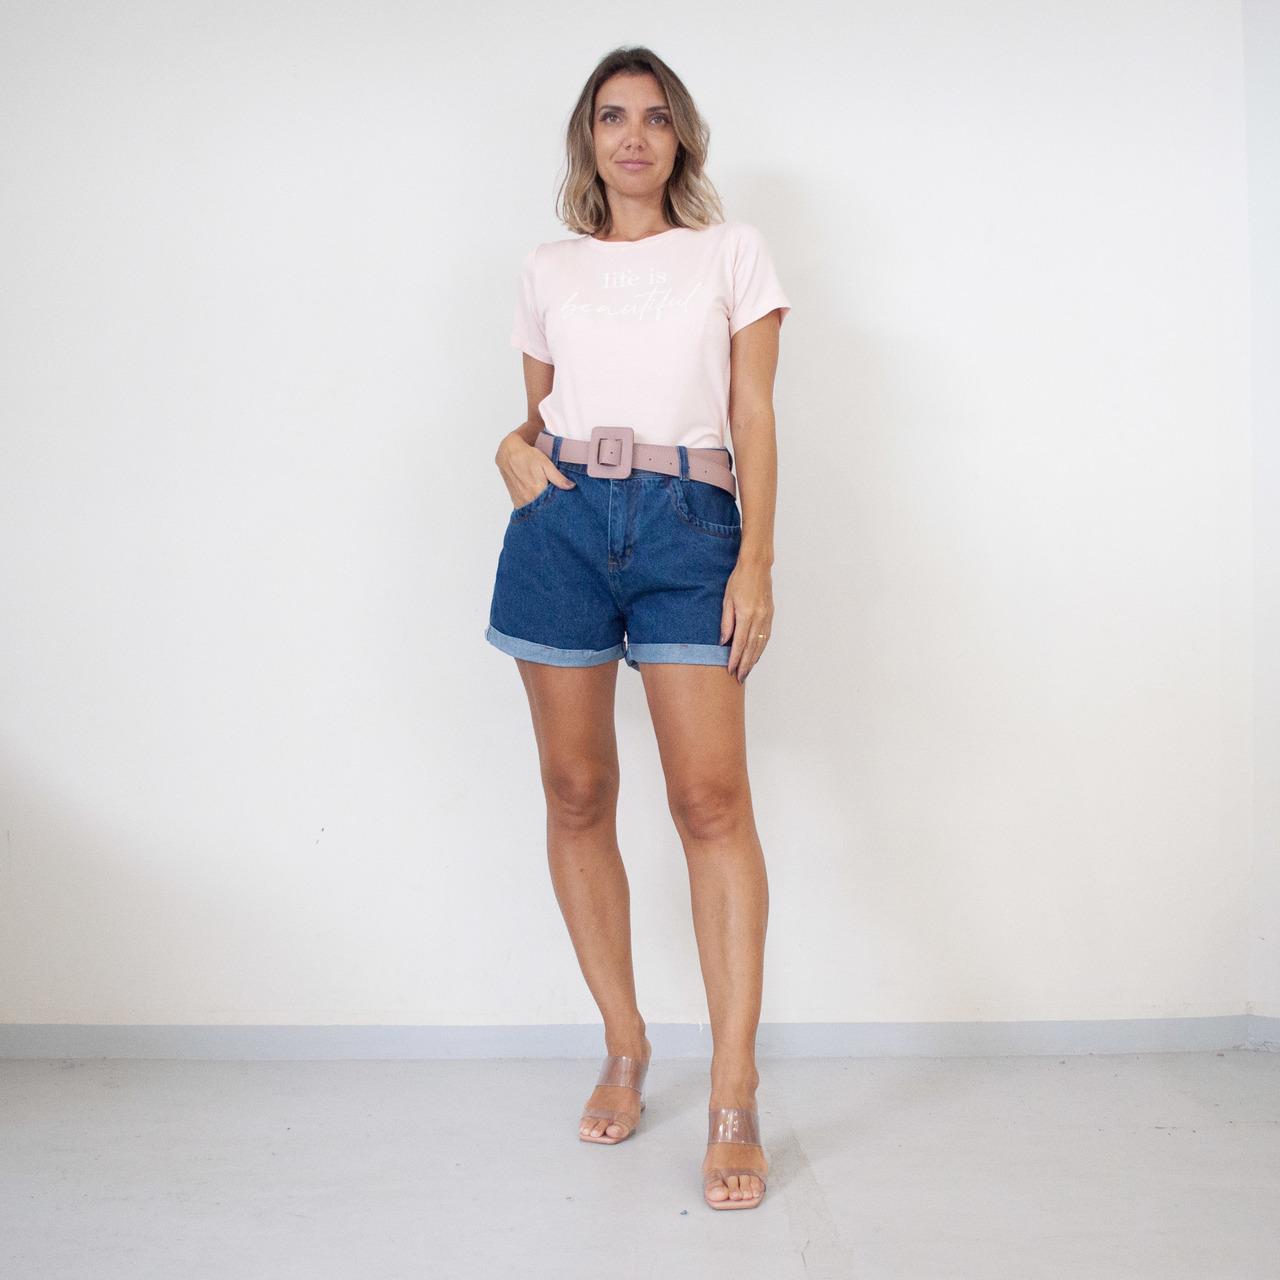 T-Shirt Viscolycra Gola U - Beautiful - Rosa Claro